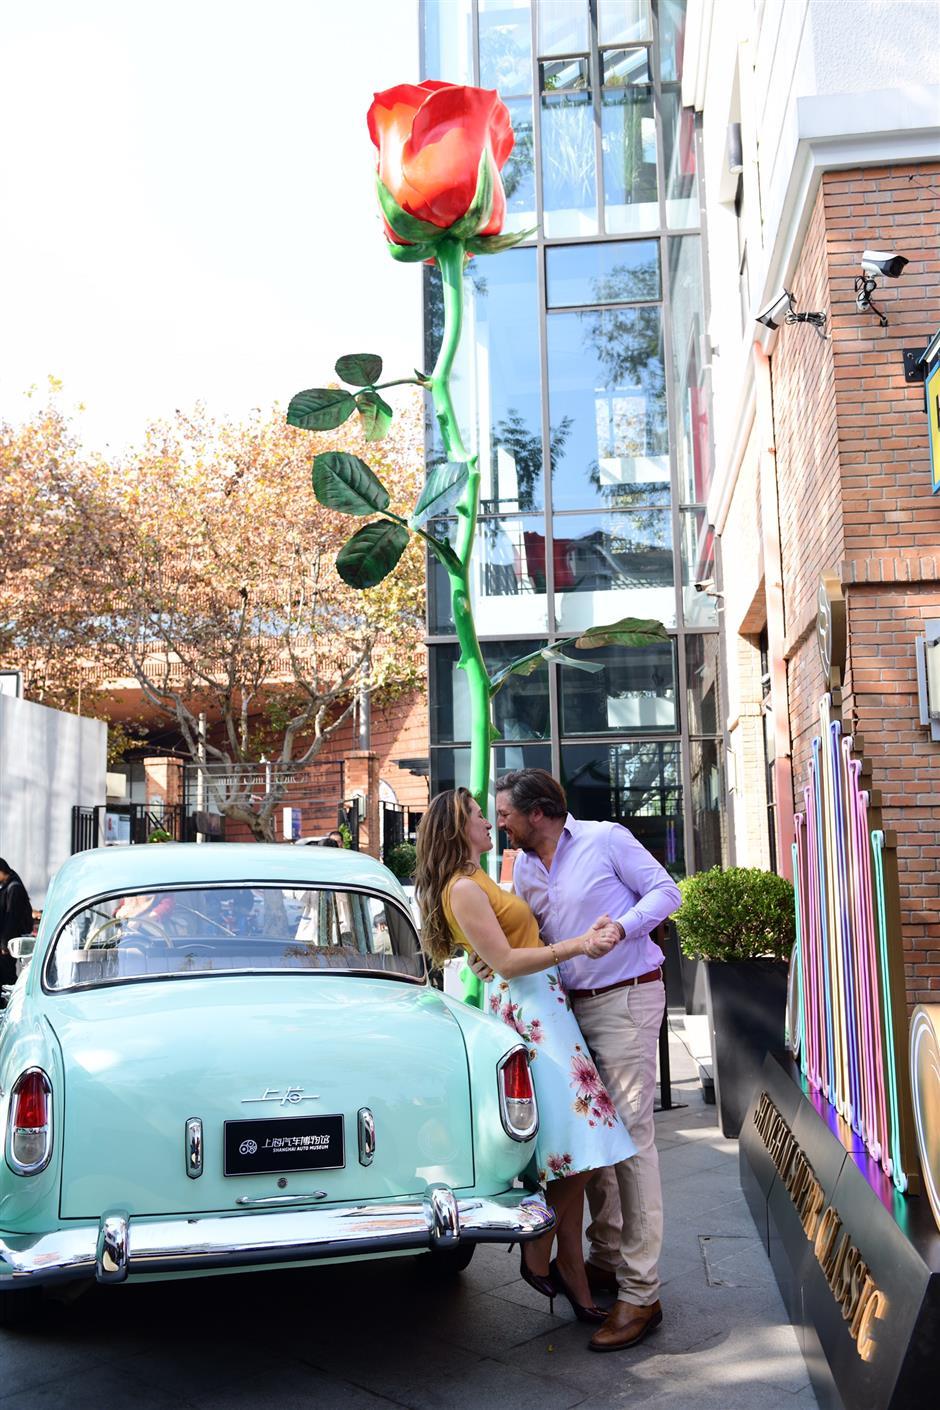 Shanghai Super Classic, a vintage car lovers' treat